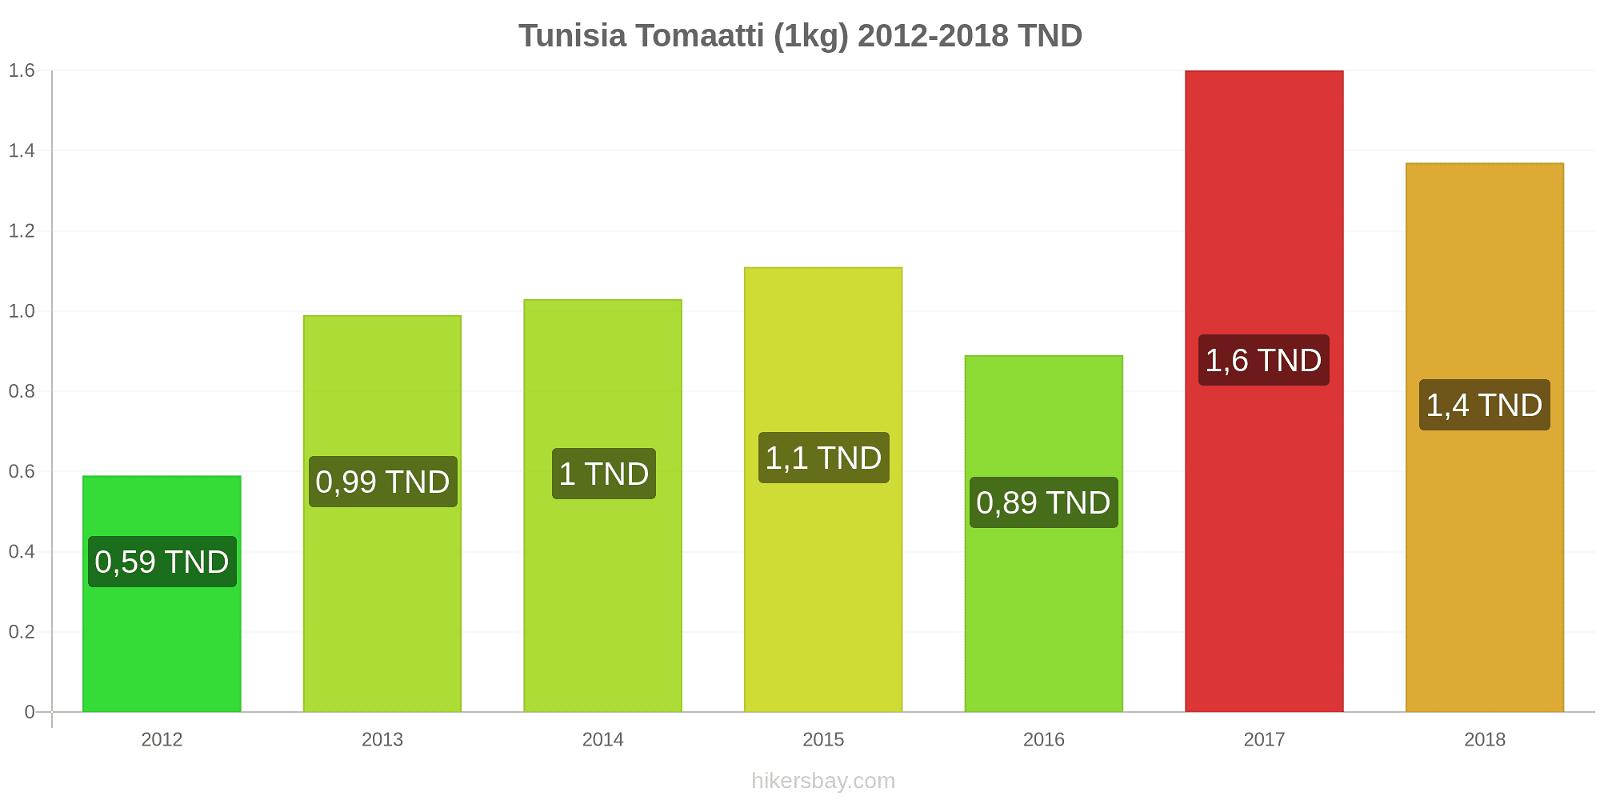 Tunisia hintojen muutokset Tomaatti (1kg) hikersbay.com